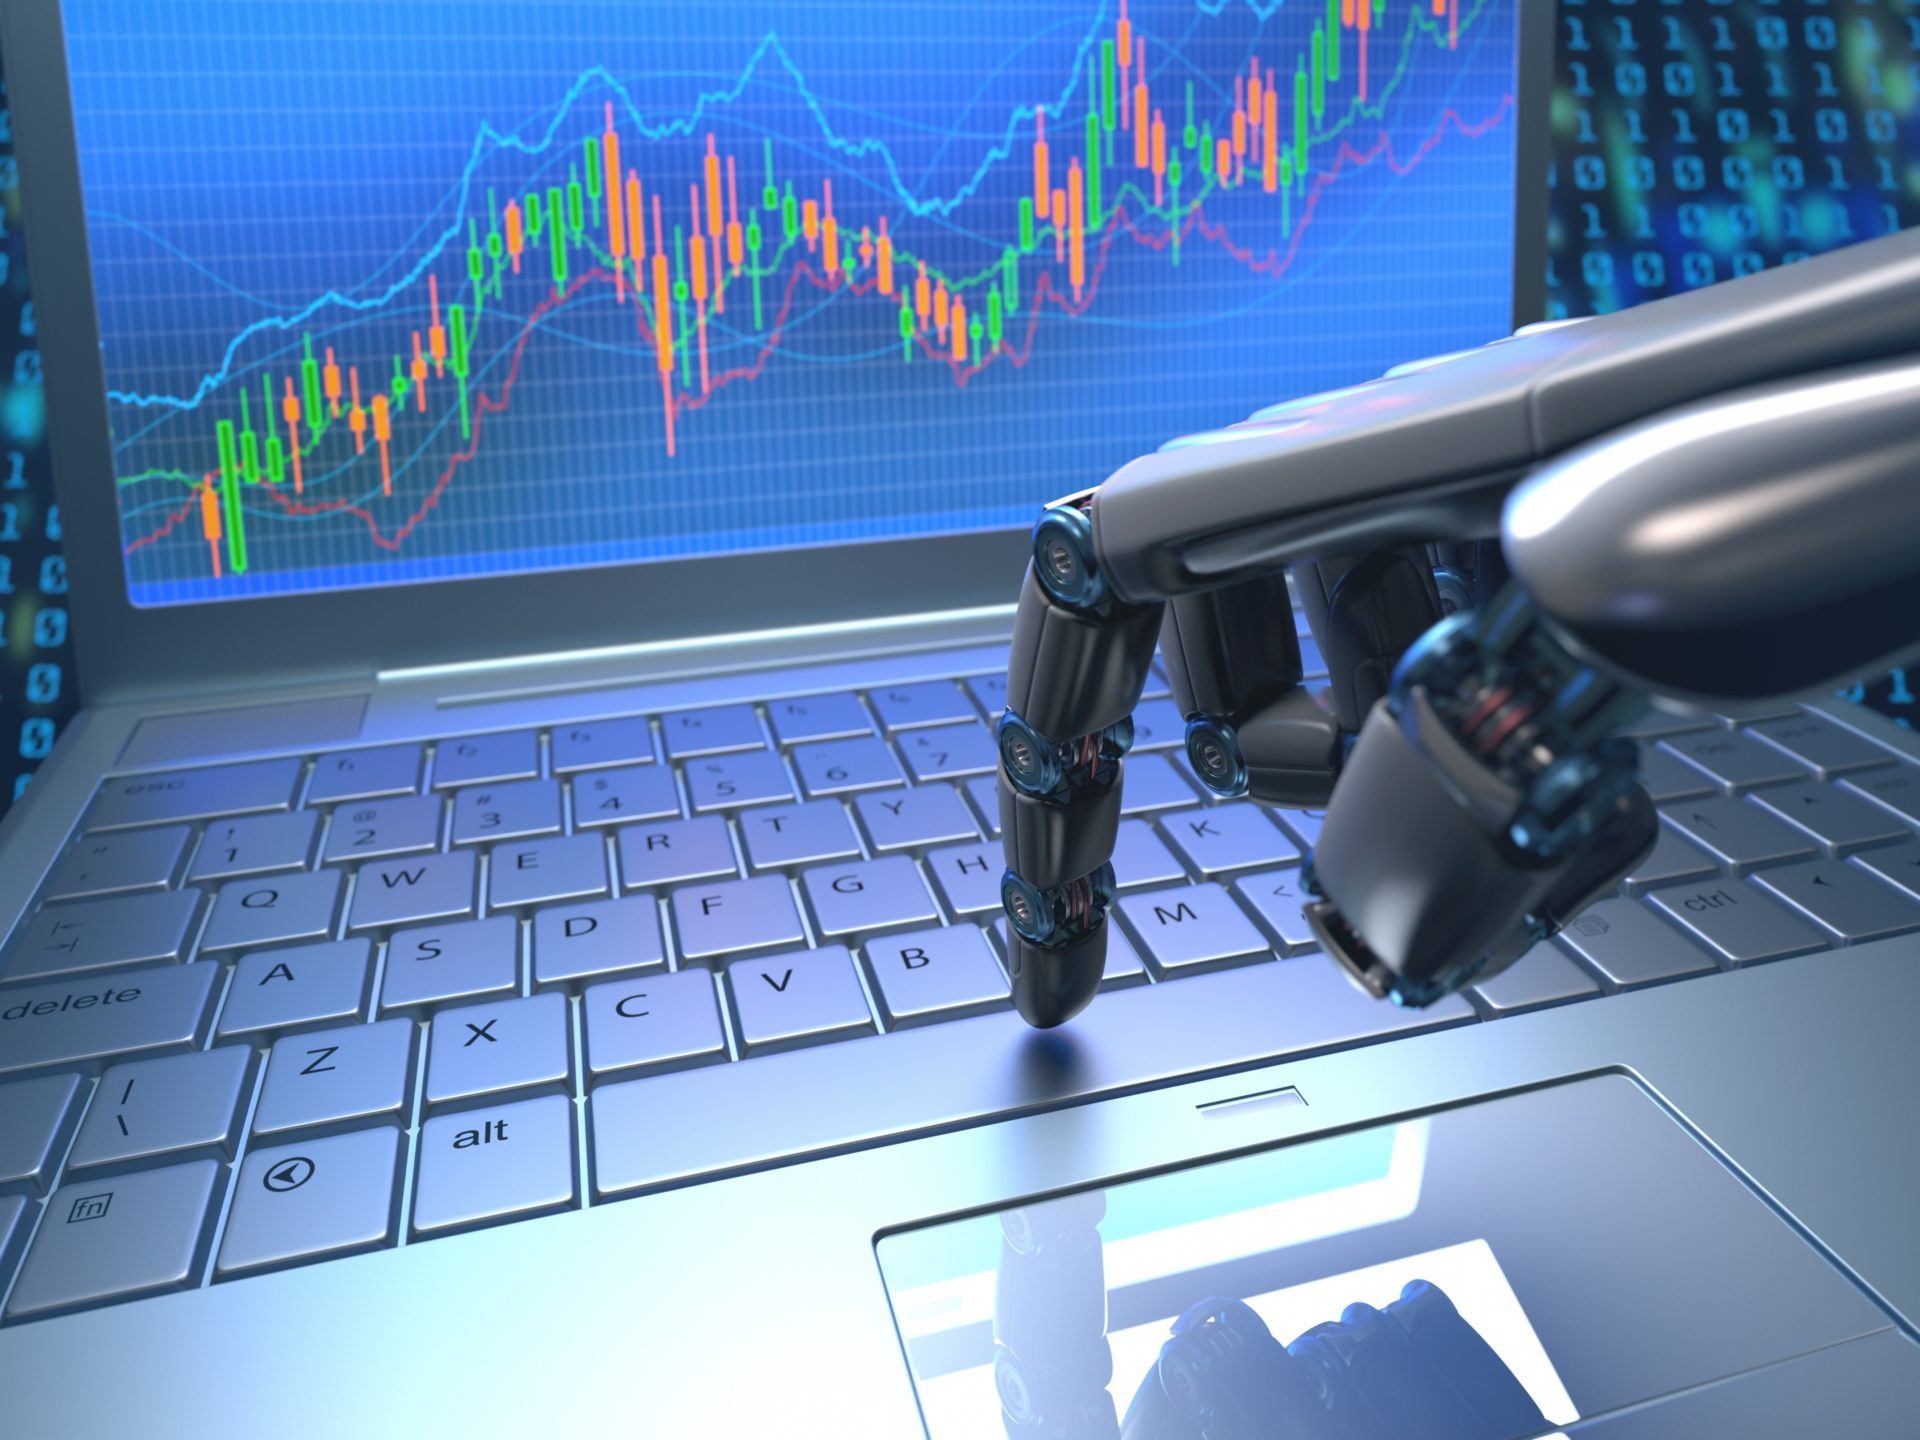 robot-technology-work-future-bbva